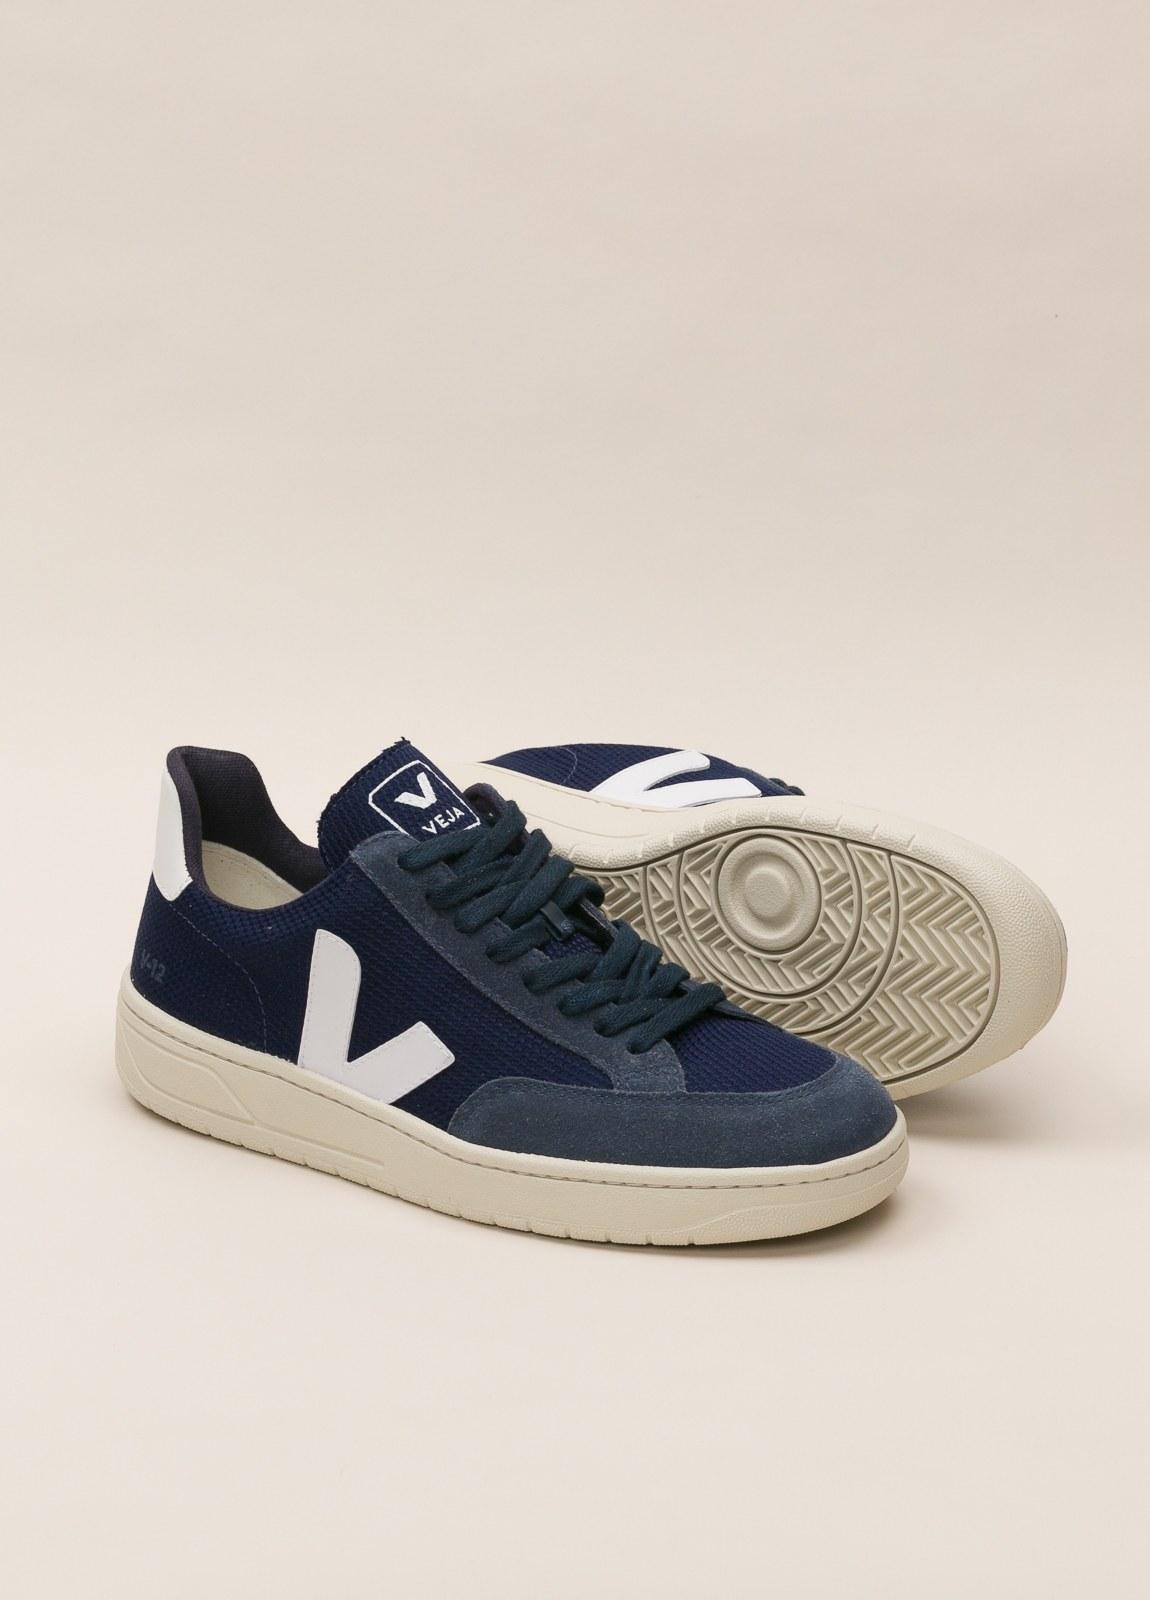 Zapatillas casual VEJA azul - Ítem3